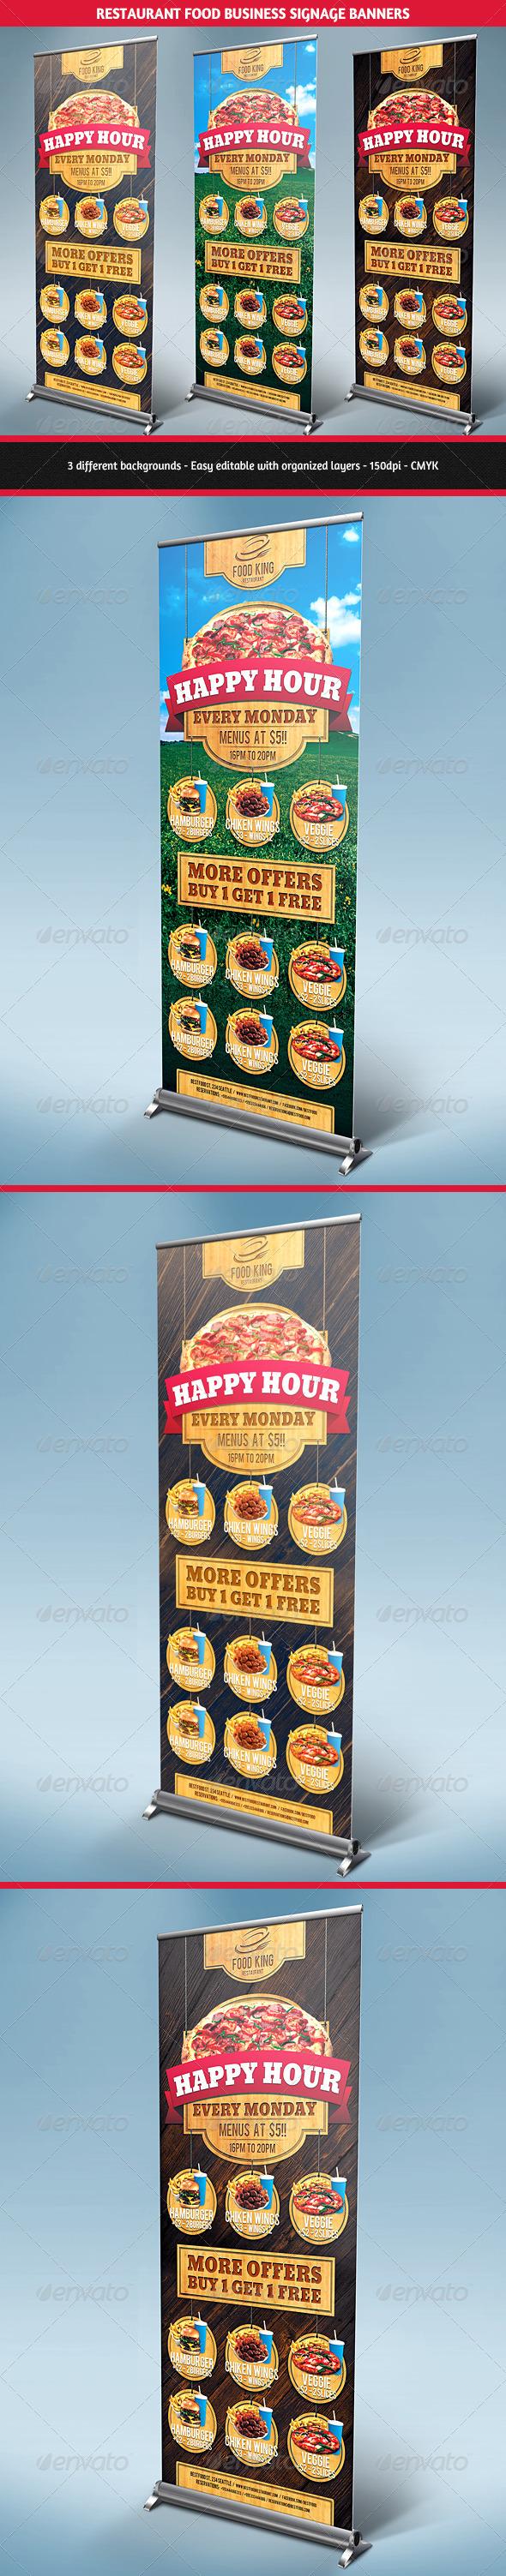 Restaurant Food Promotion Signage Banners - Signage Print Templates